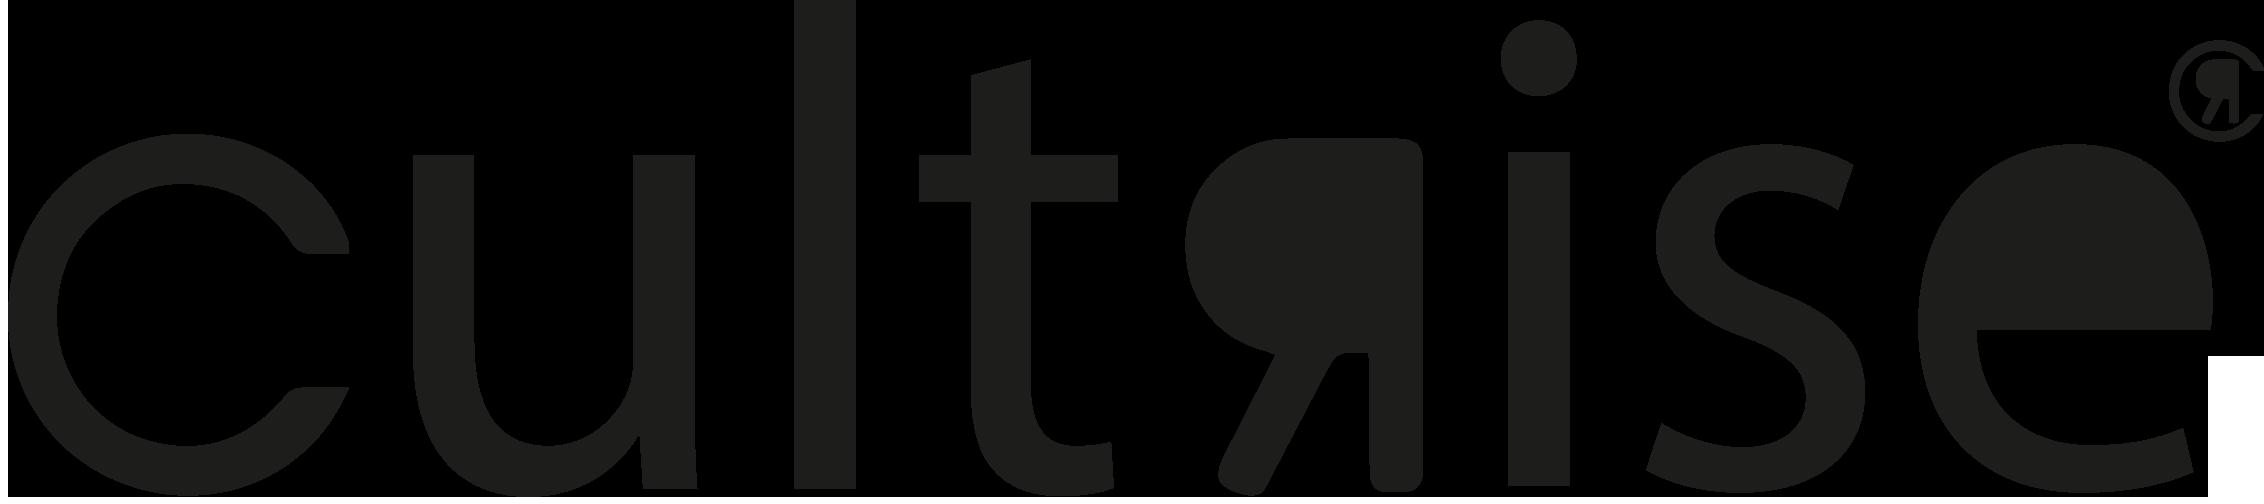 cultrise logo copy.png